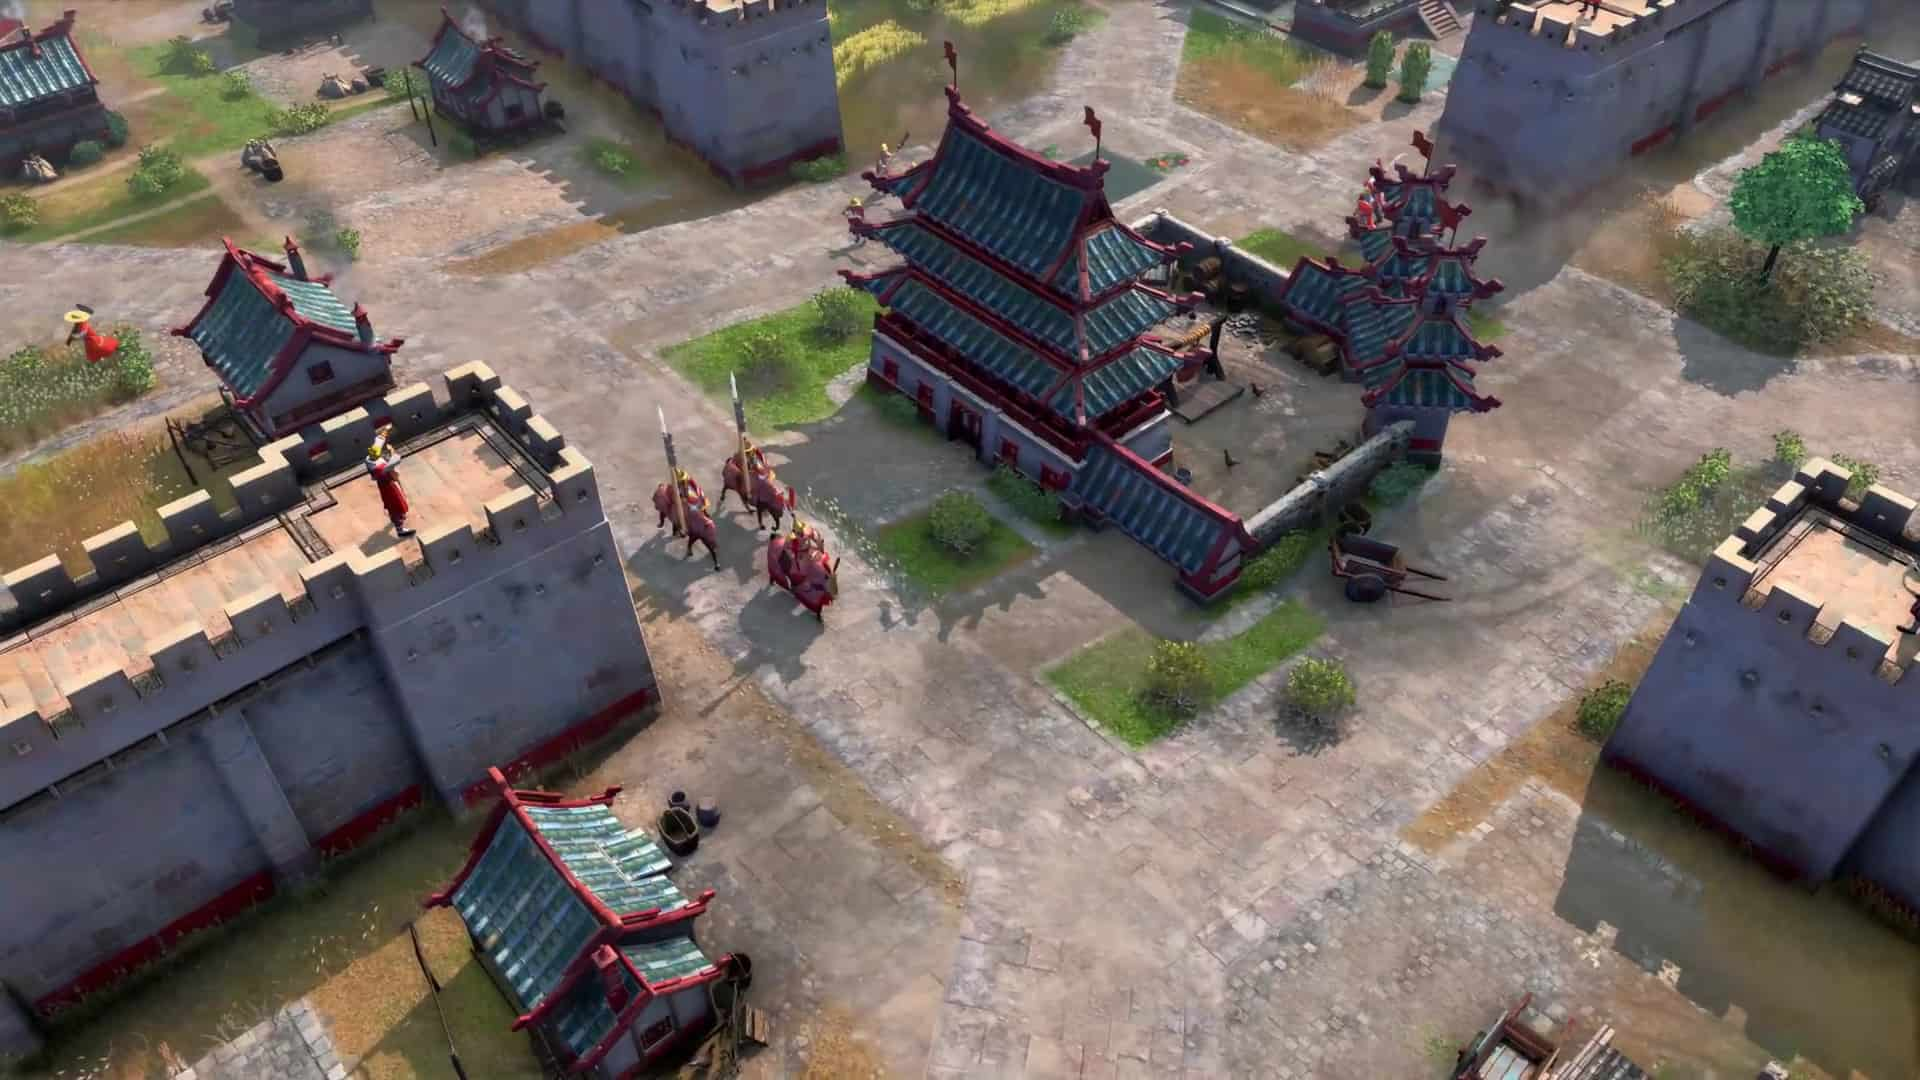 MS, '에이지 오브 엠파이어: 팬 프리뷰'로 게임플레이 & 확장팩 계획 등 공개